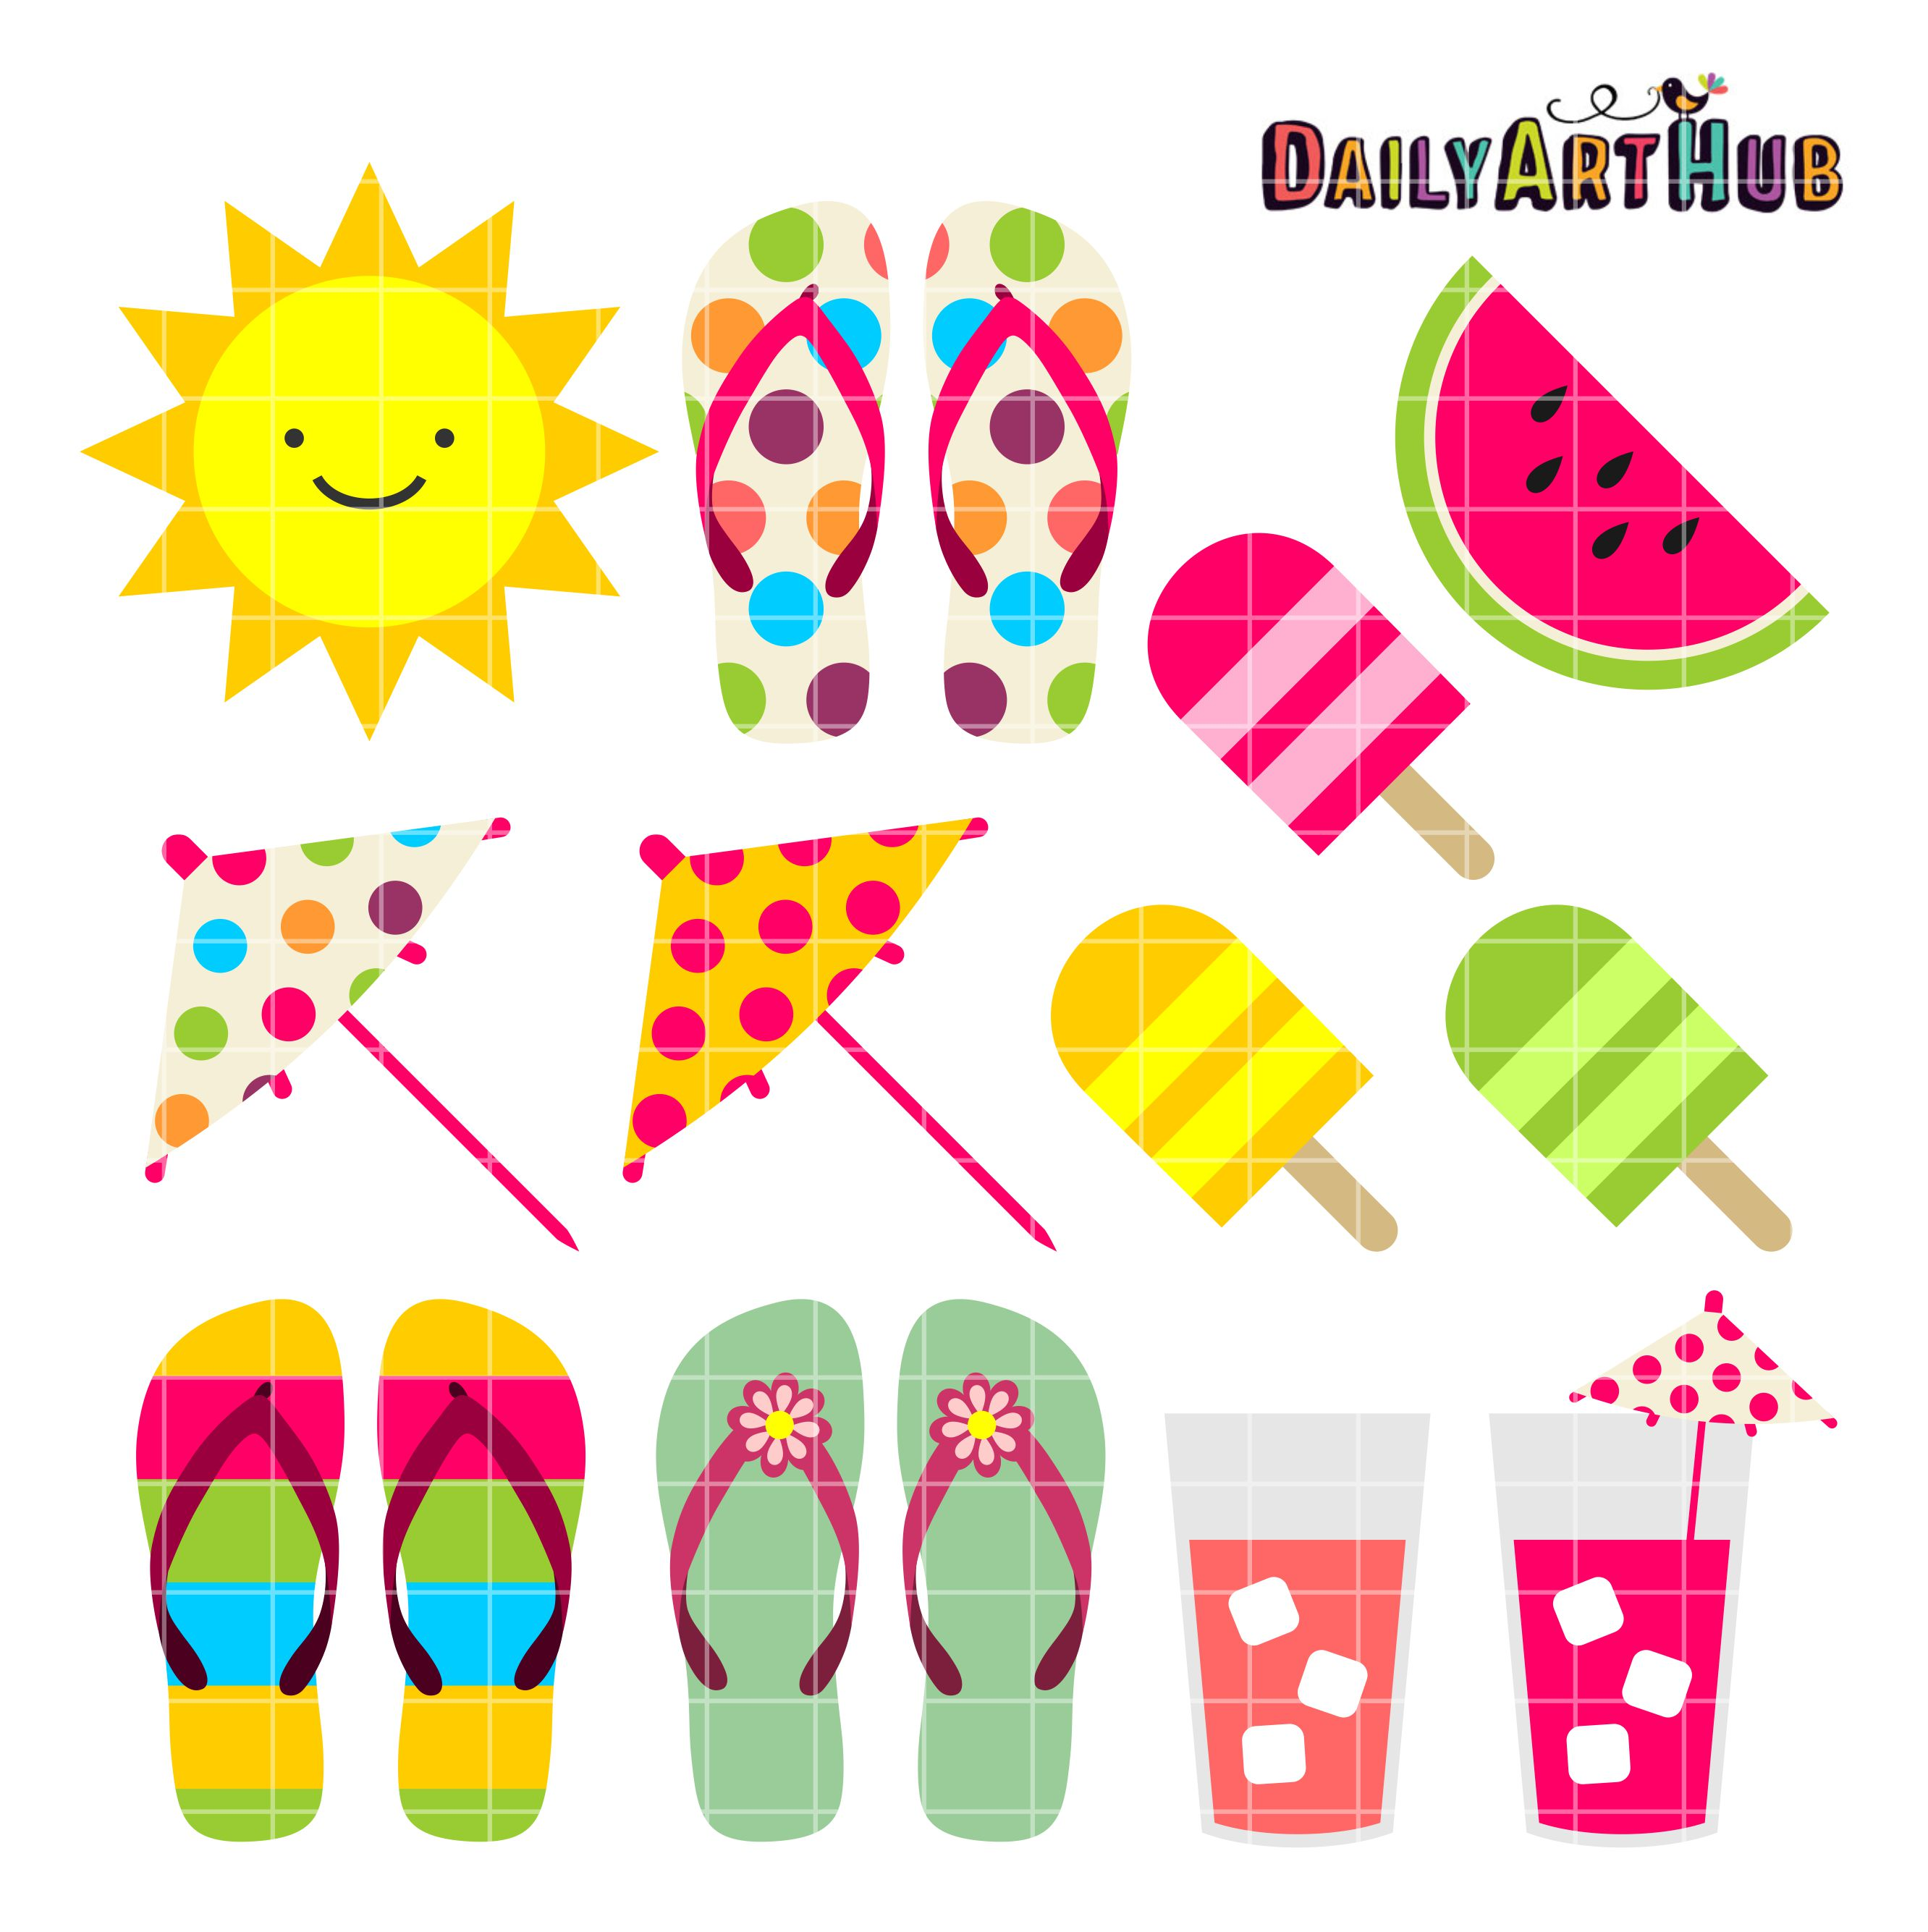 361717579 Summer Things Clip Art Set – Daily Art Hub – Free Clip Art Everyday